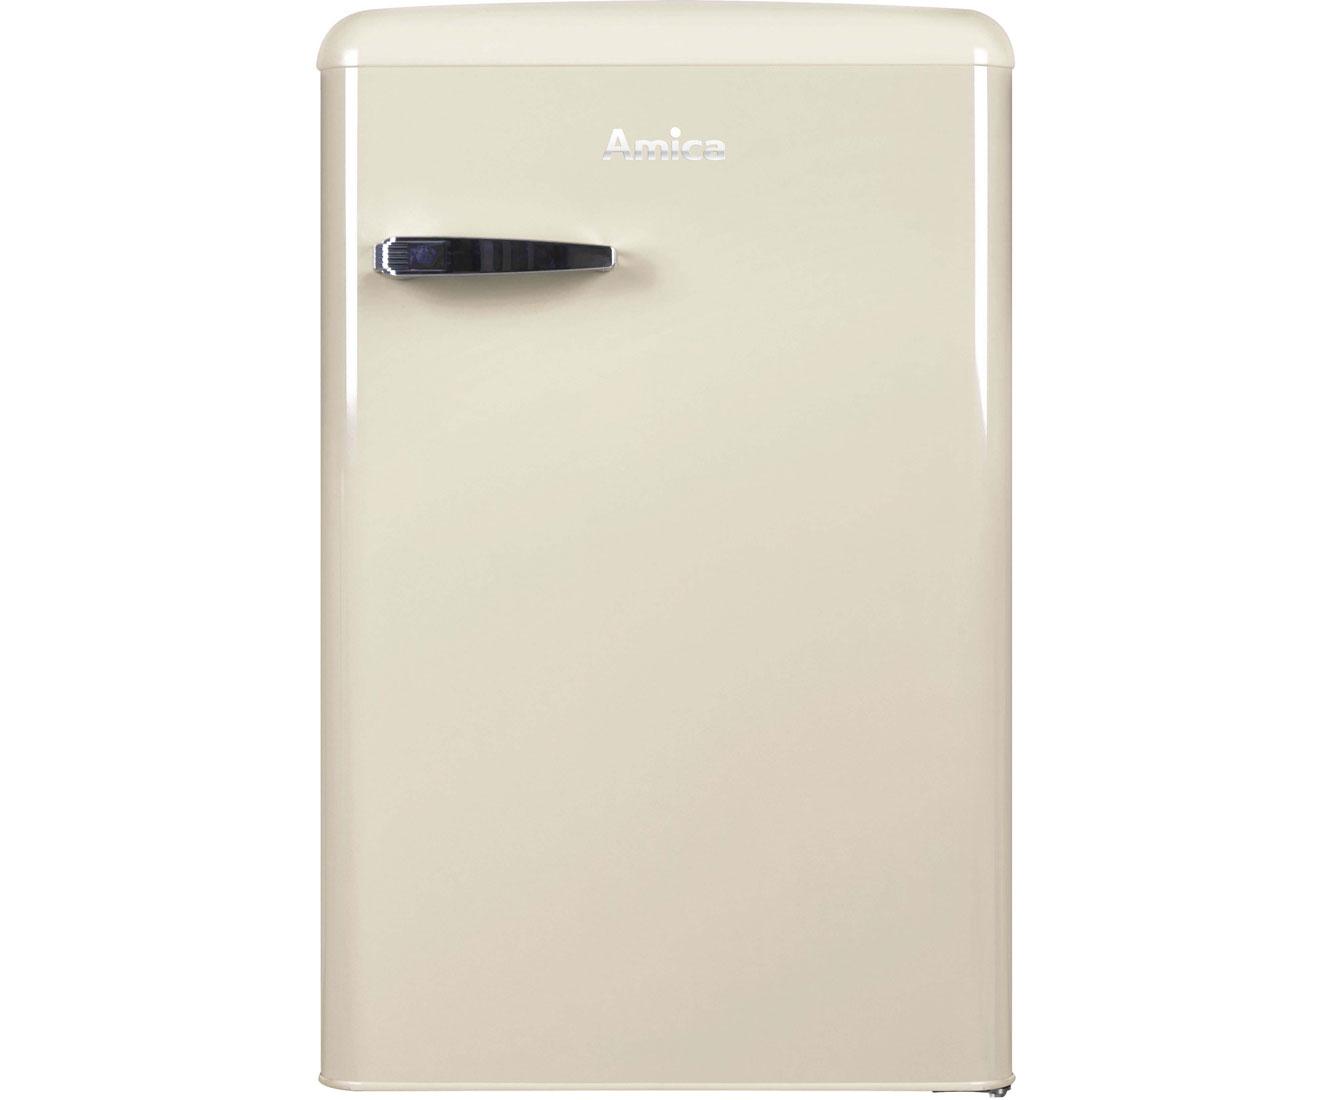 Retro Kühlschrank Kaufen : Kühlschrank kombi retro gorenje spartage bei ao z b rote retro